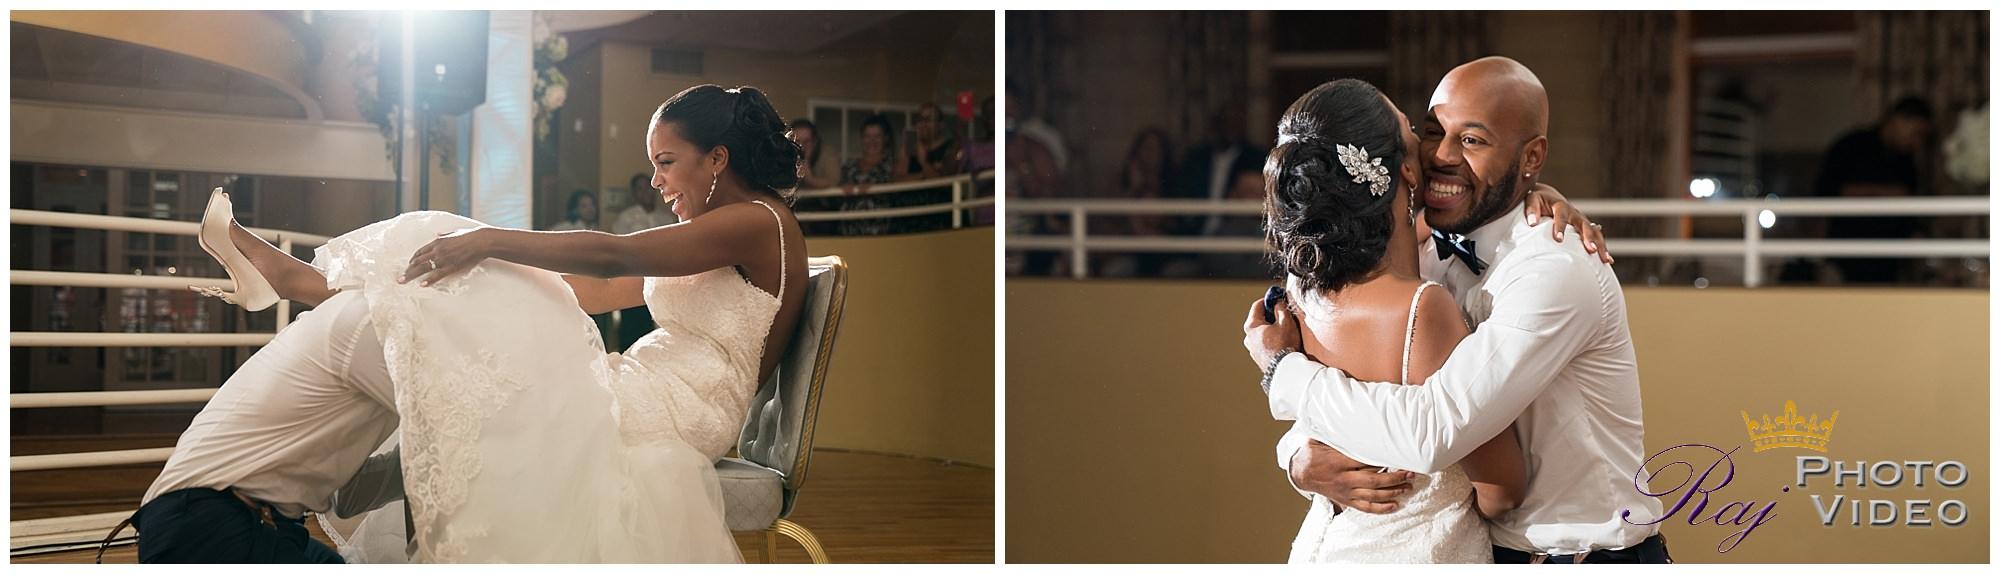 The-Armory-Perth-Amboy-NJ-Catholic-Wedding-Yudelkis-Stephen-26.jpg